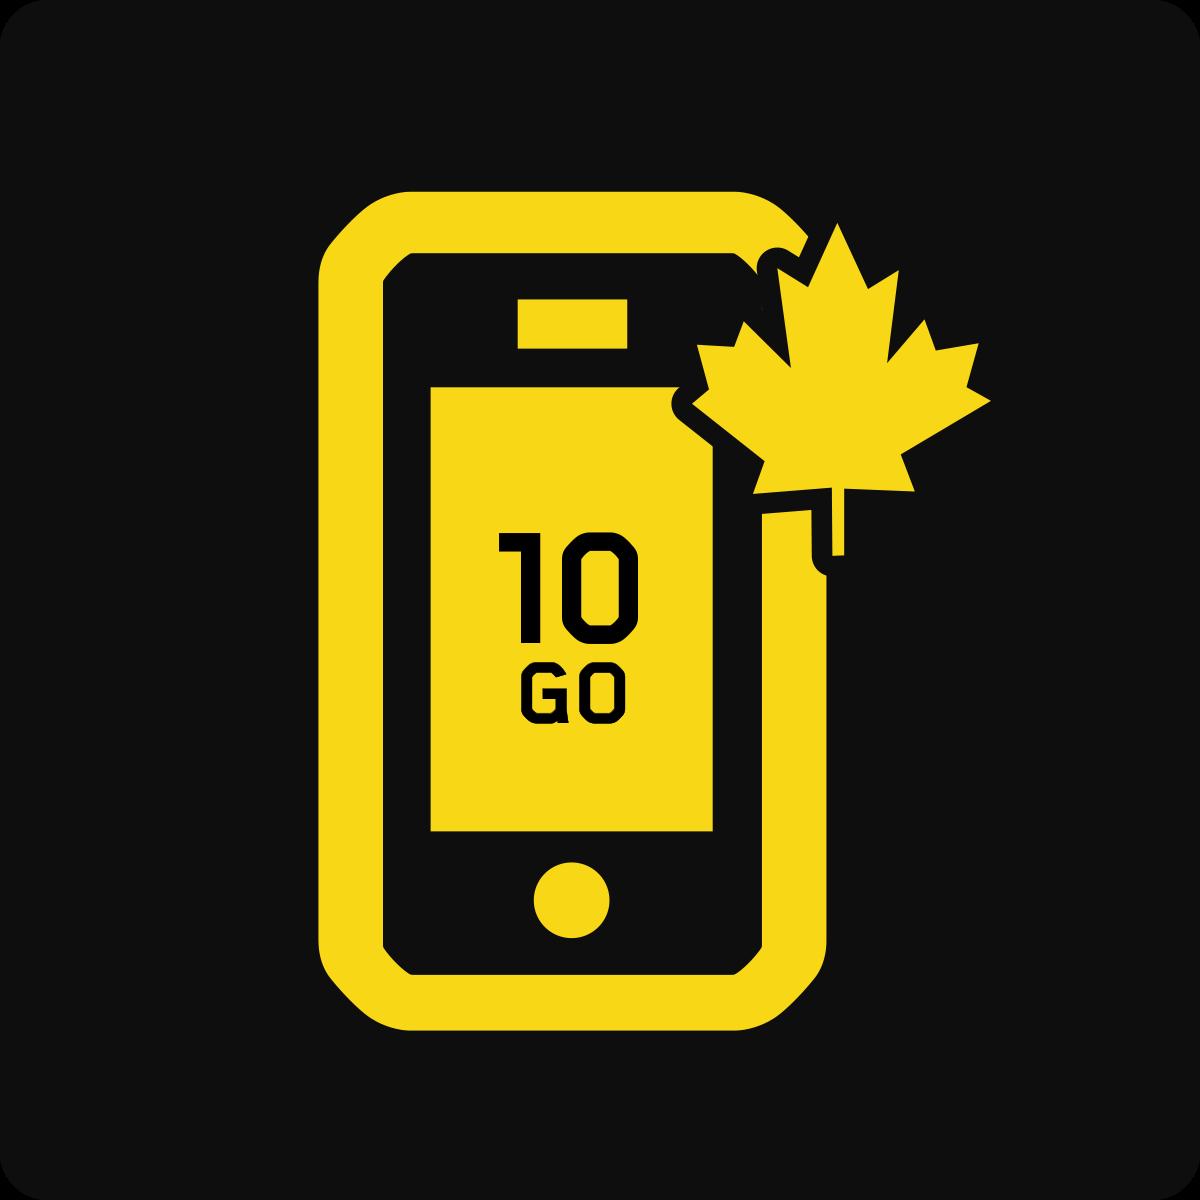 Forfait Mobile Affaires Canada 10Go